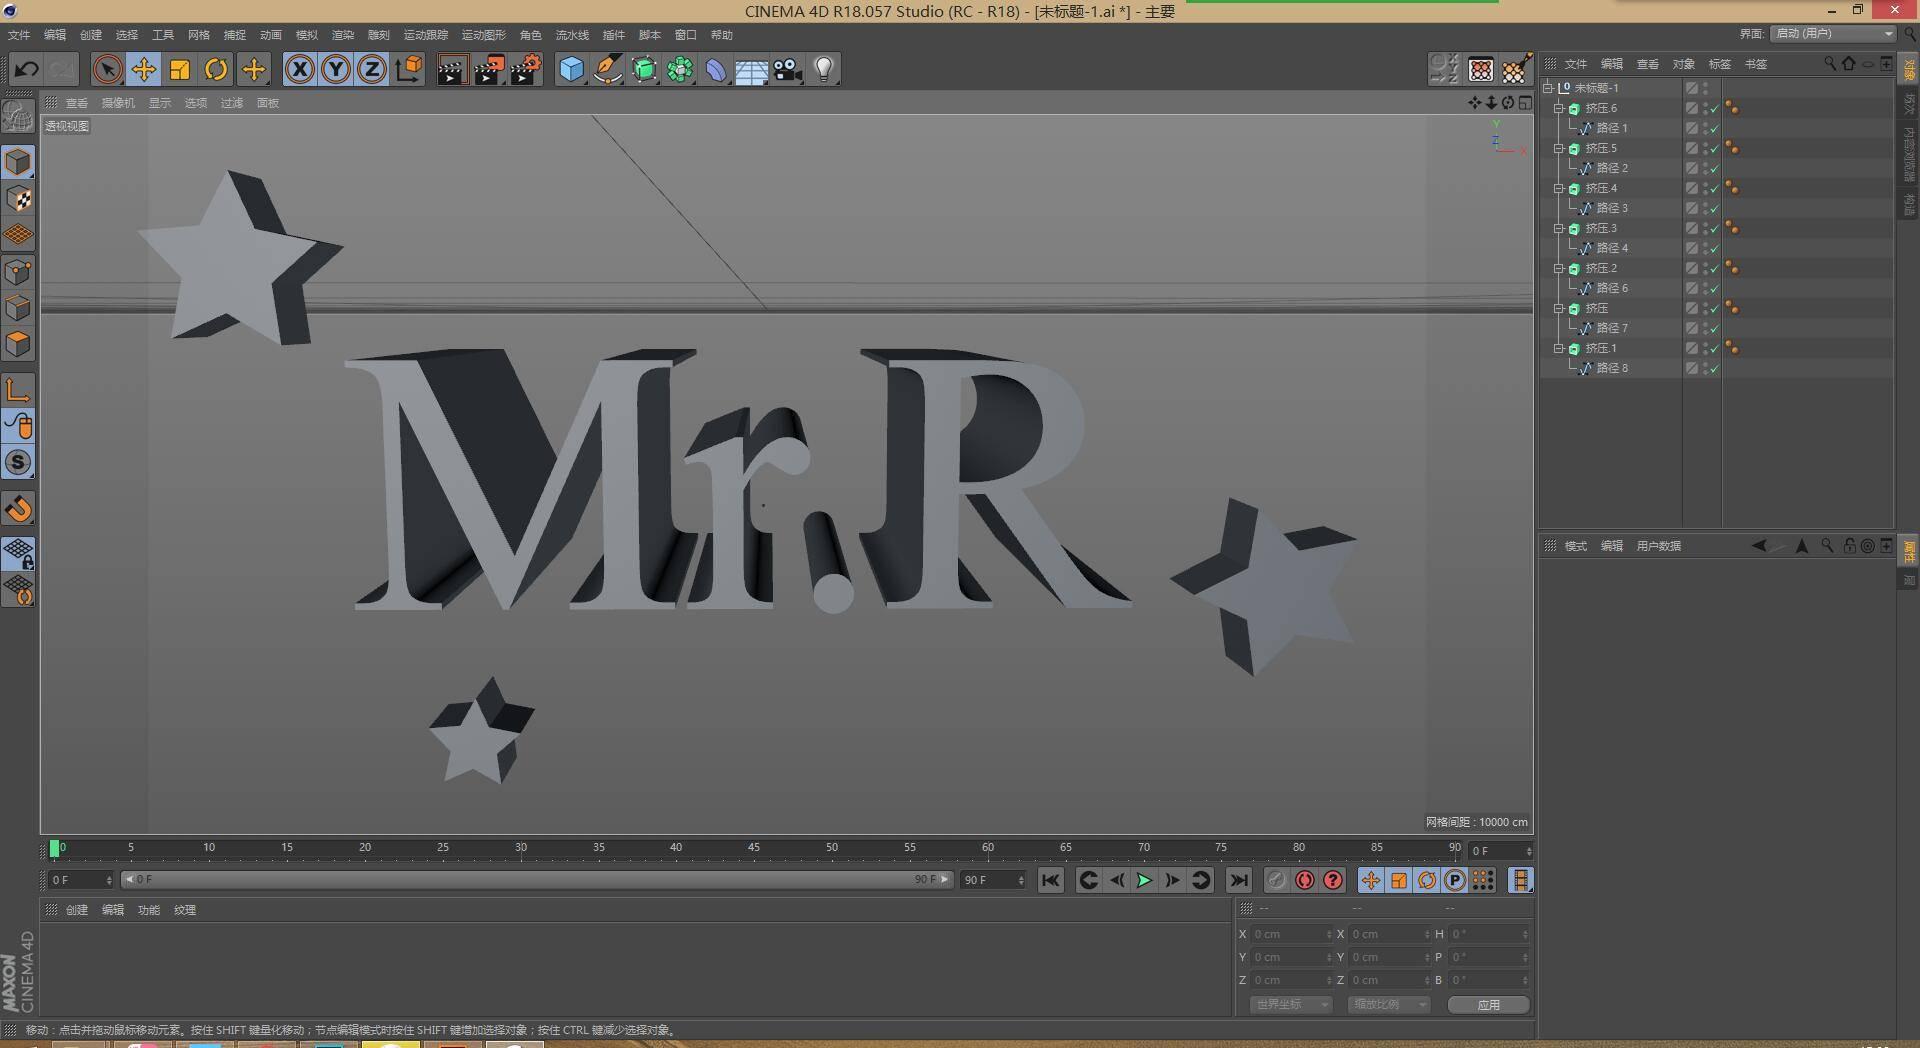 CINEMA 4D入门 (50):使用Adobe Illustrator 结合 C4D 设计 - R站|学习使我快乐! - 8